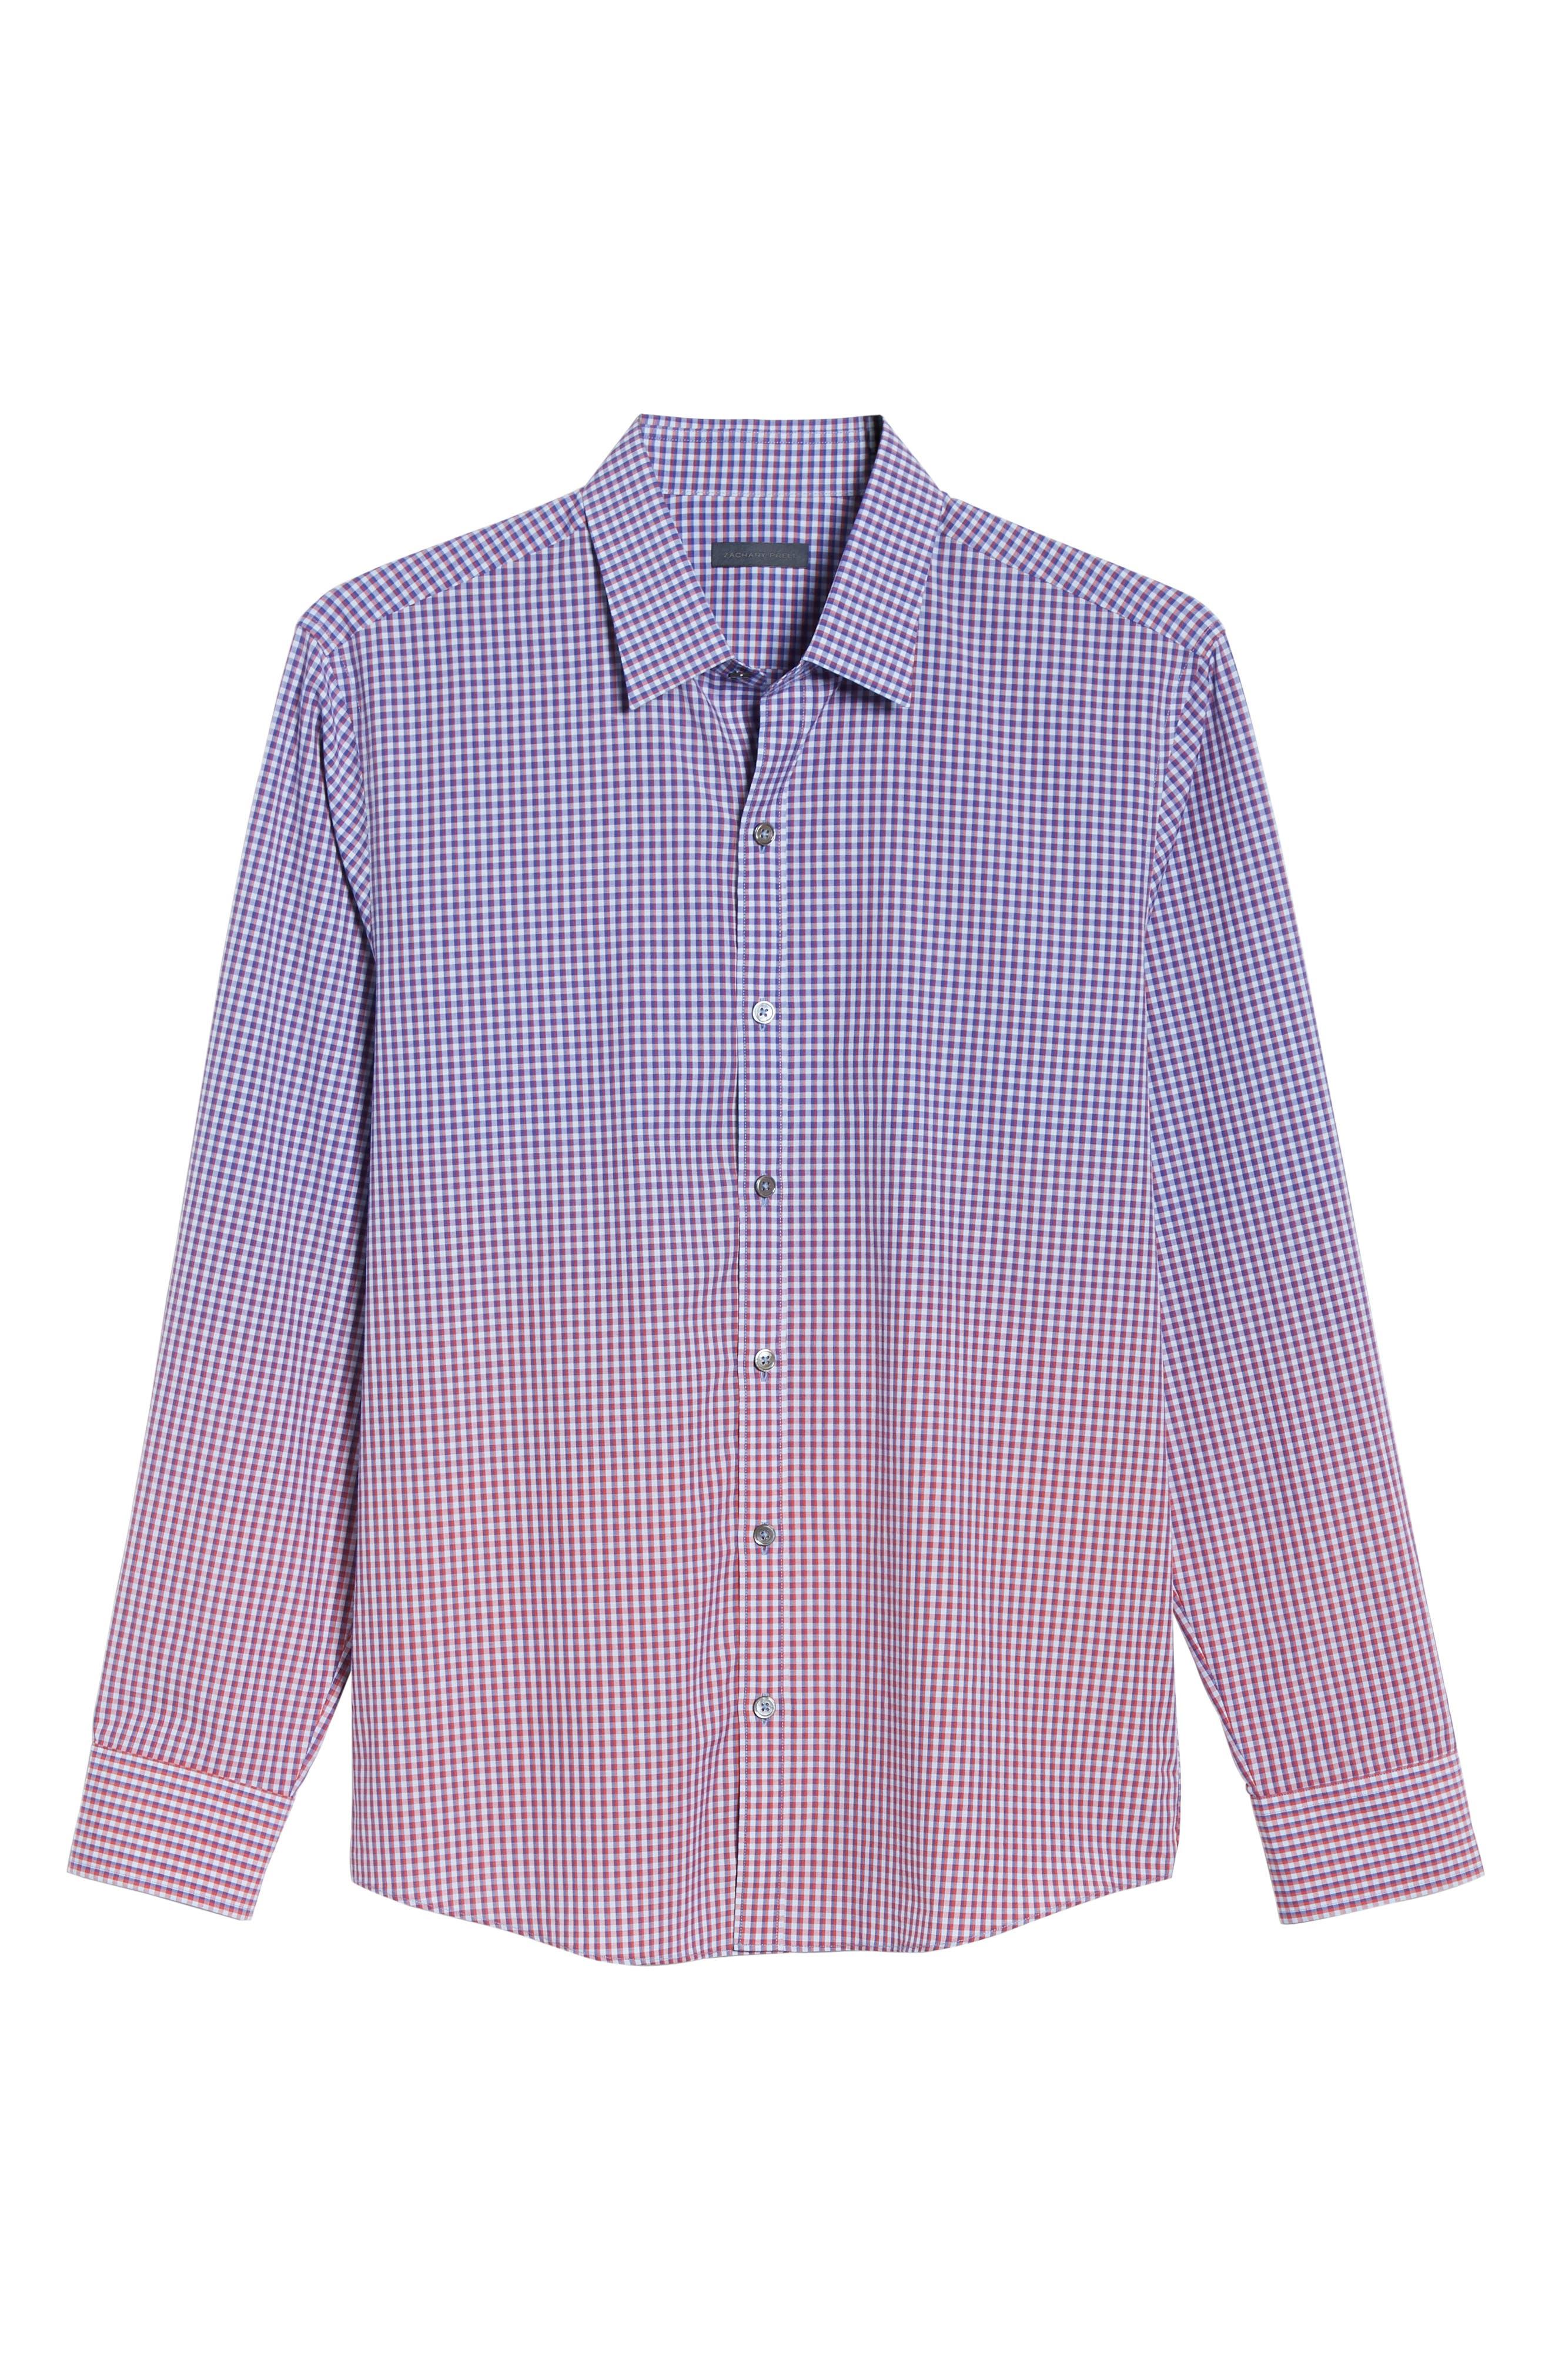 ZACHARY PRELL, Germain Regular Fit Gradient Check Sport Shirt, Alternate thumbnail 5, color, RED